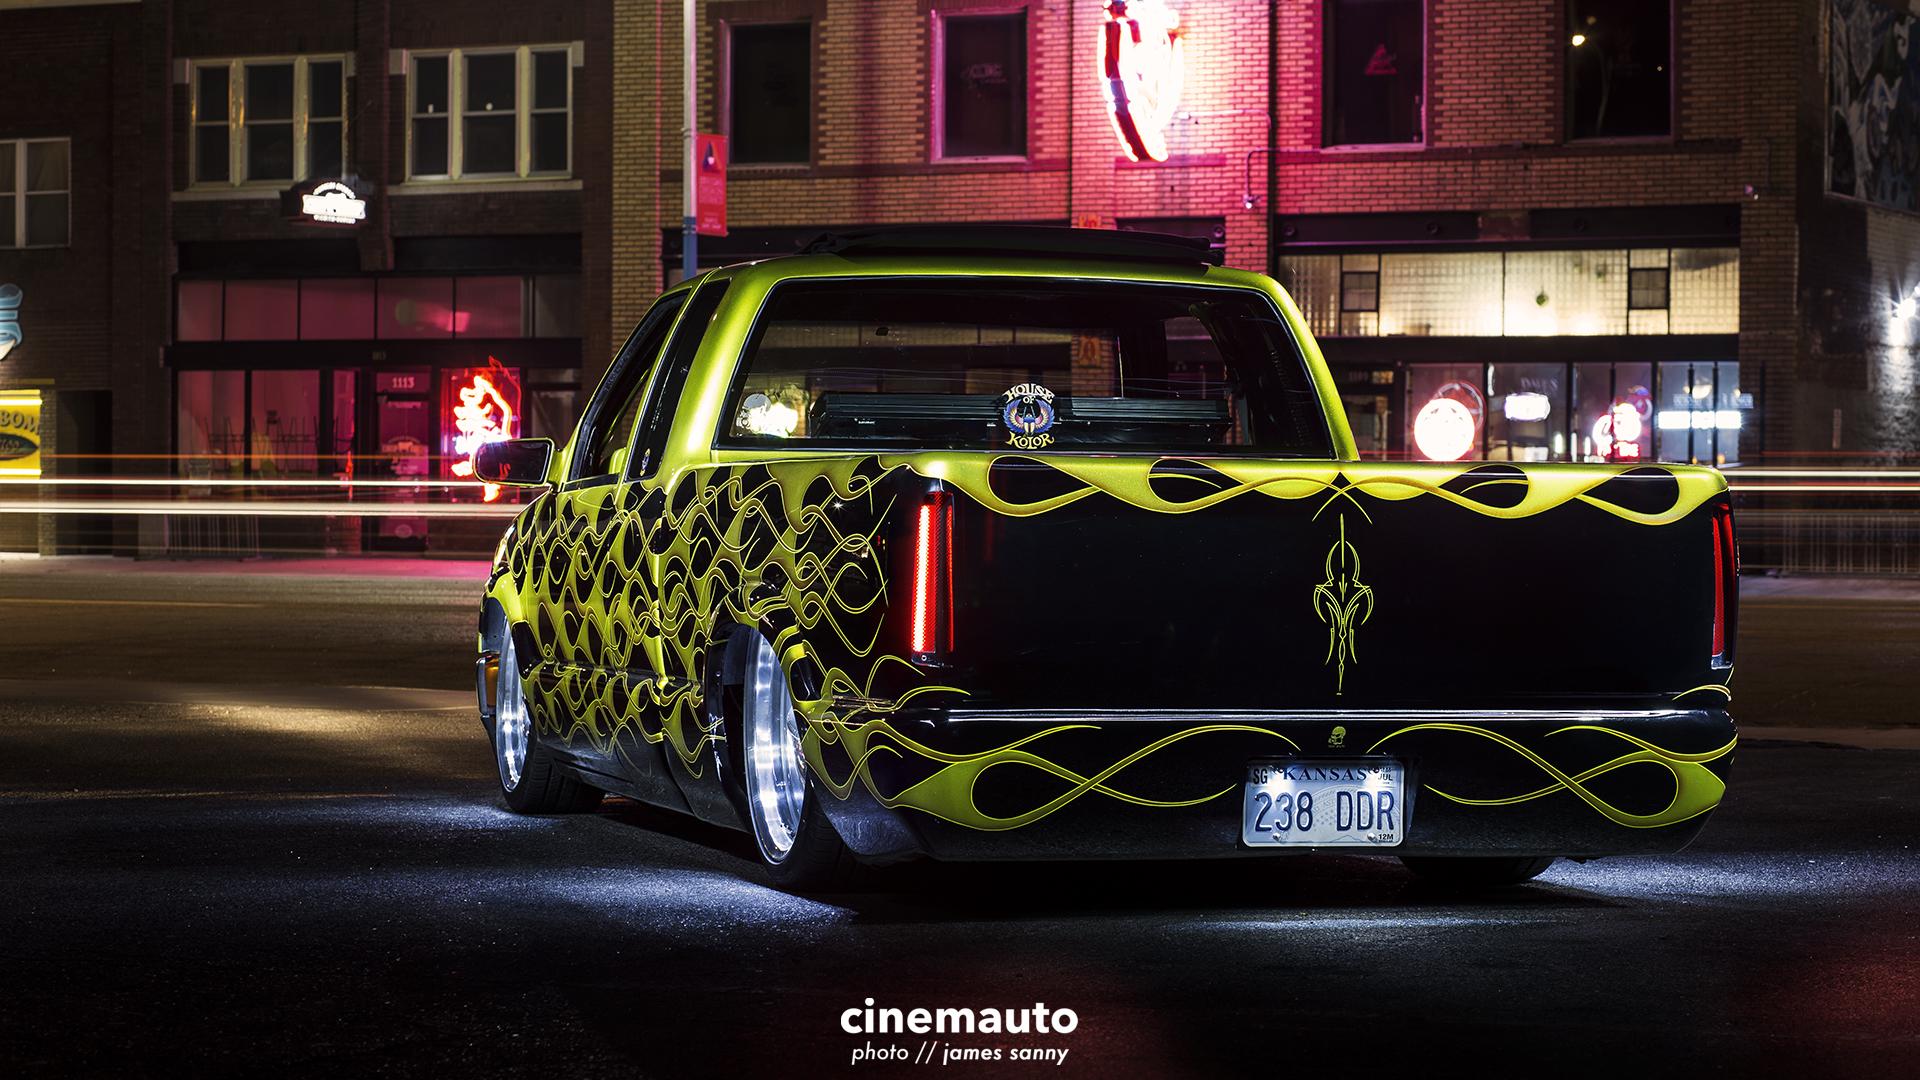 cinemauto-wichita-automotive-photographer-james-sanny-Ysm.jpg